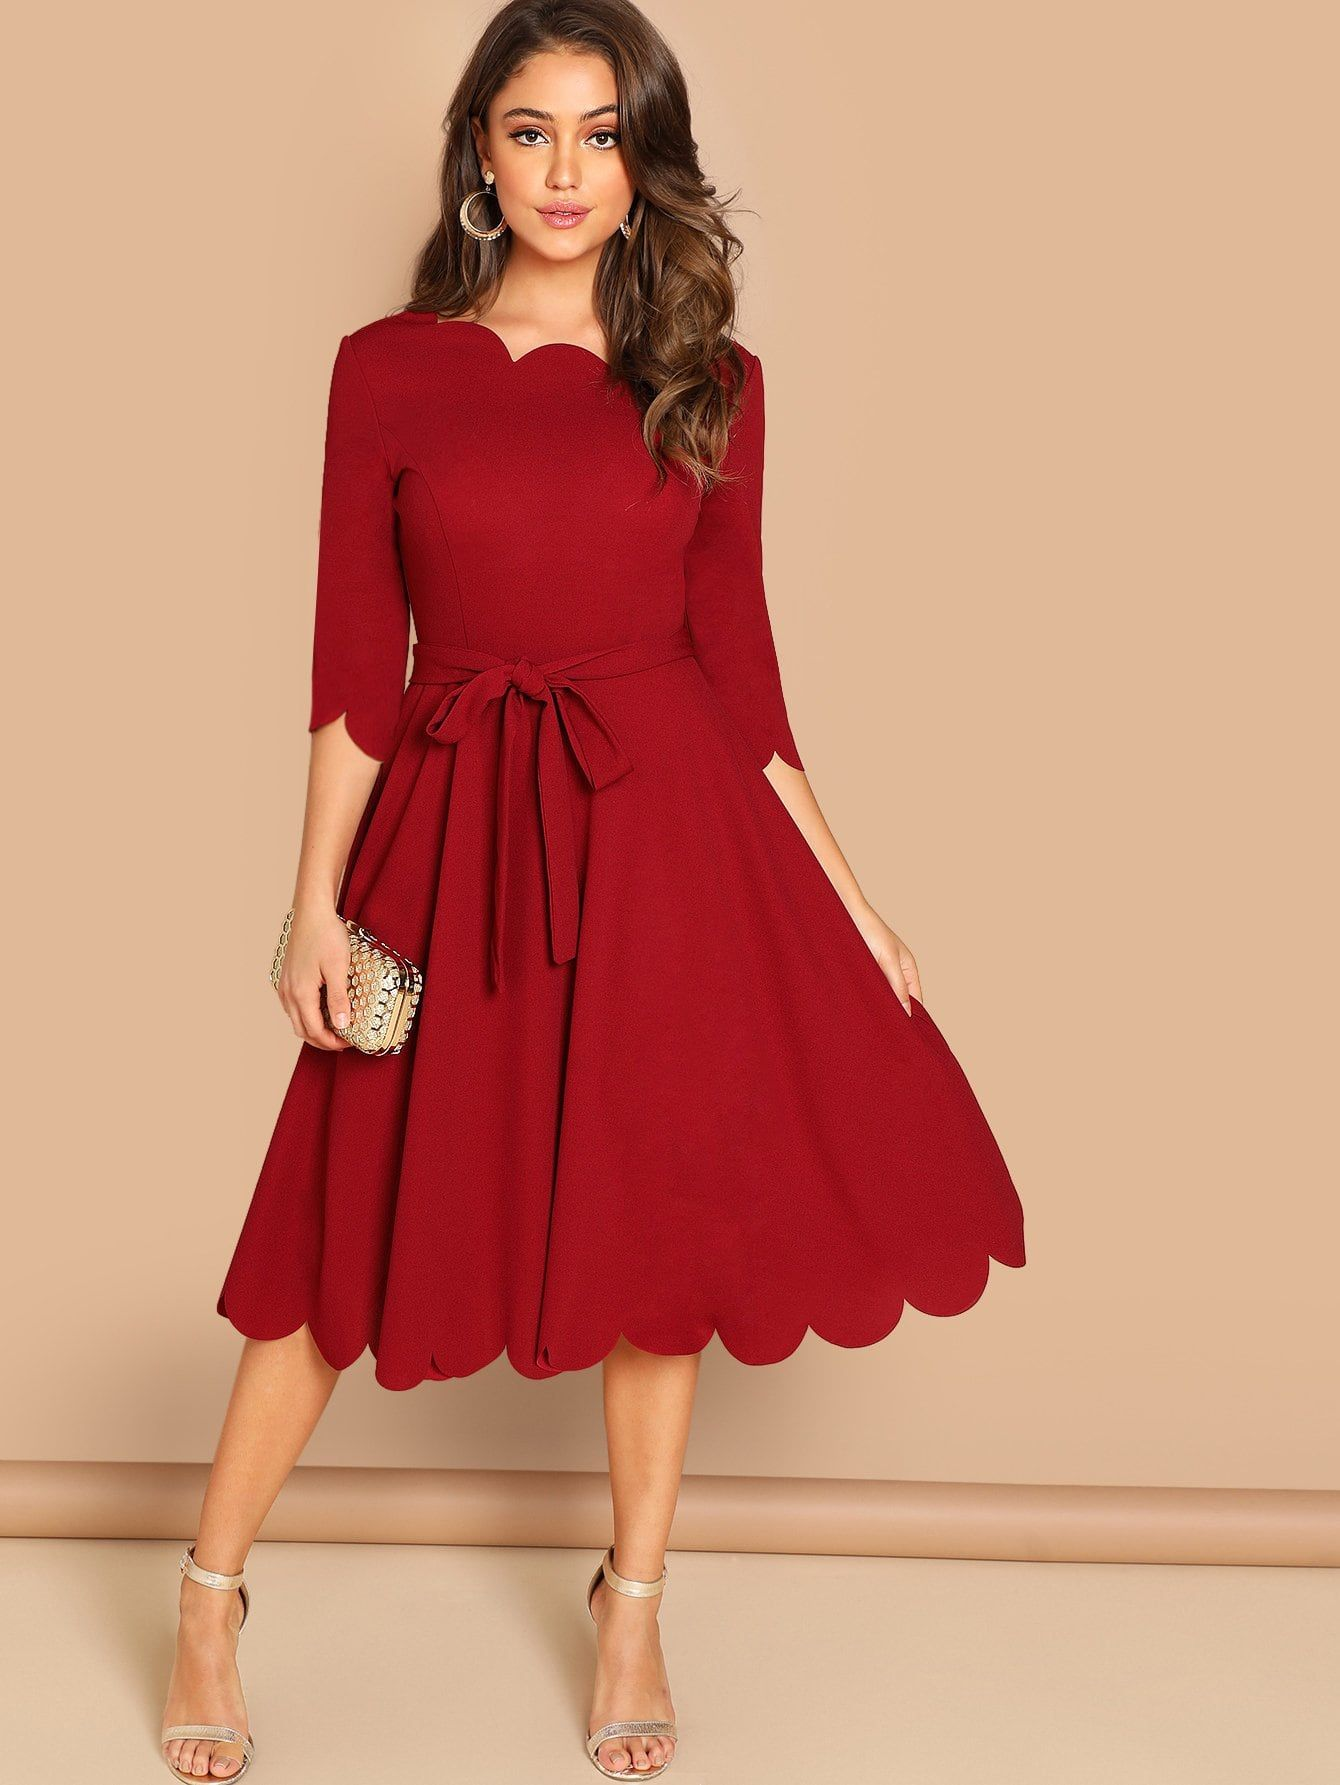 9ef53c1166 Women Elegant A Line Plain Fit and Flare Round Neck Three Quarter Length  Sleeve Regular Sleeve Natural Burgundy Midi Length Scallop Trim Fit & Flare  Dress ...